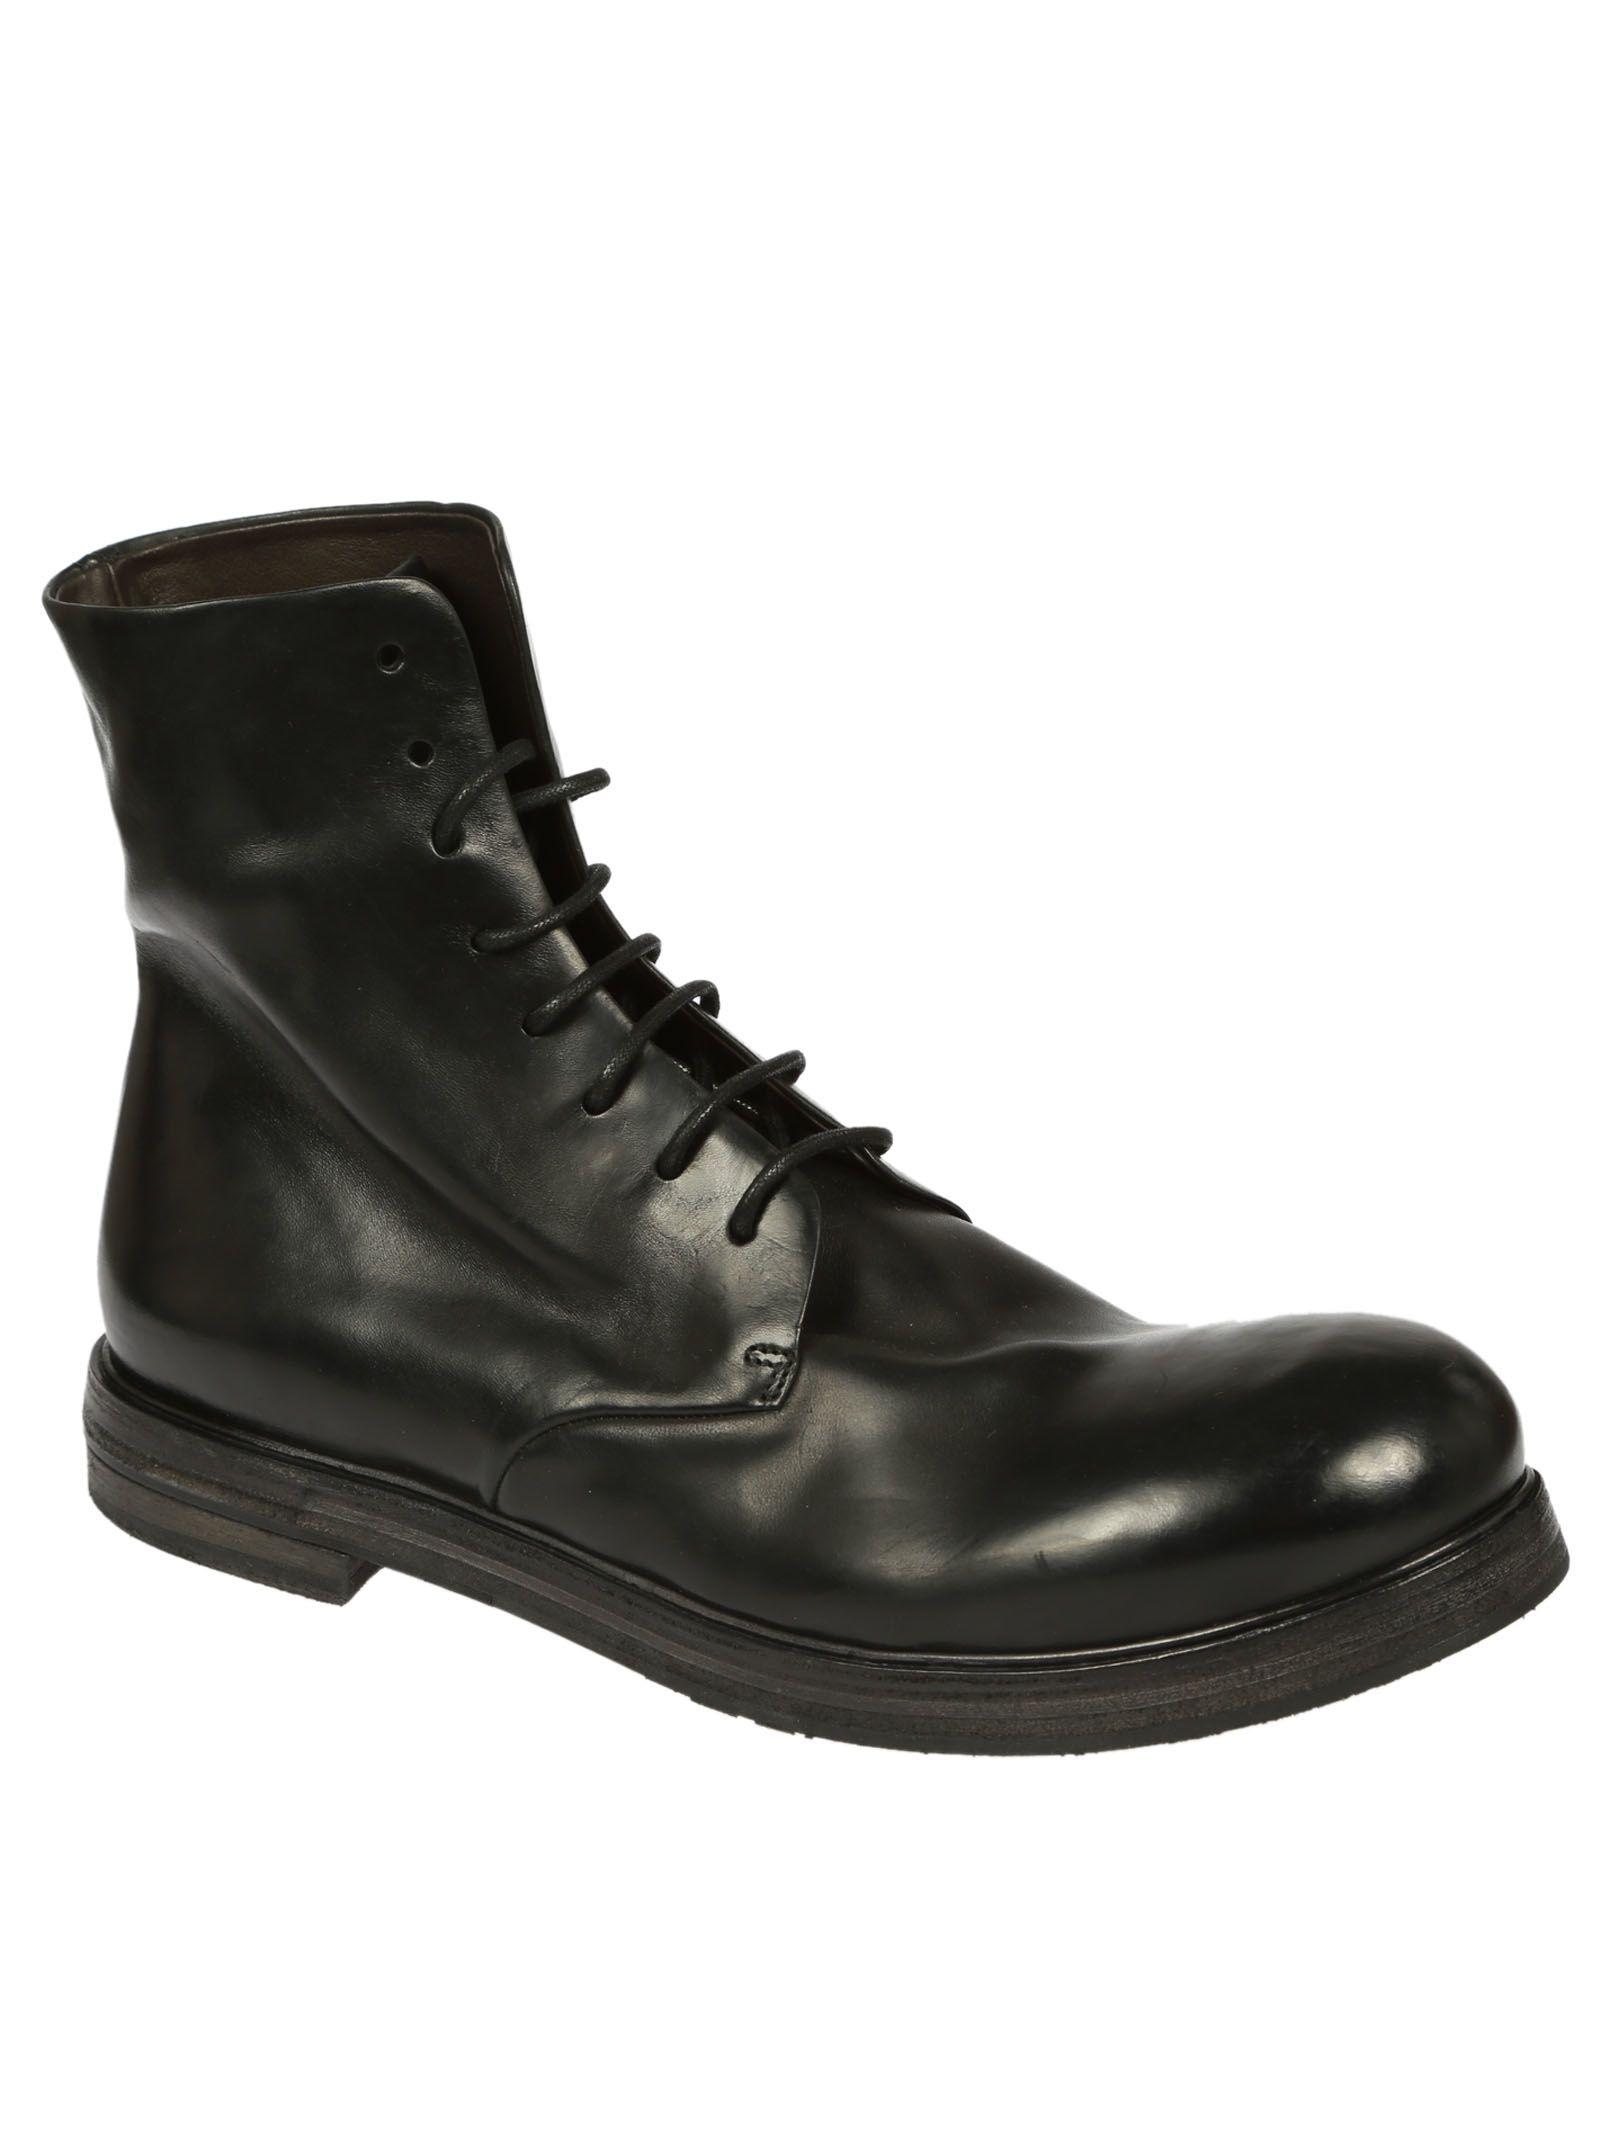 Womens Distressed Leather Combat Boots Mars��ll t0zSBdb11